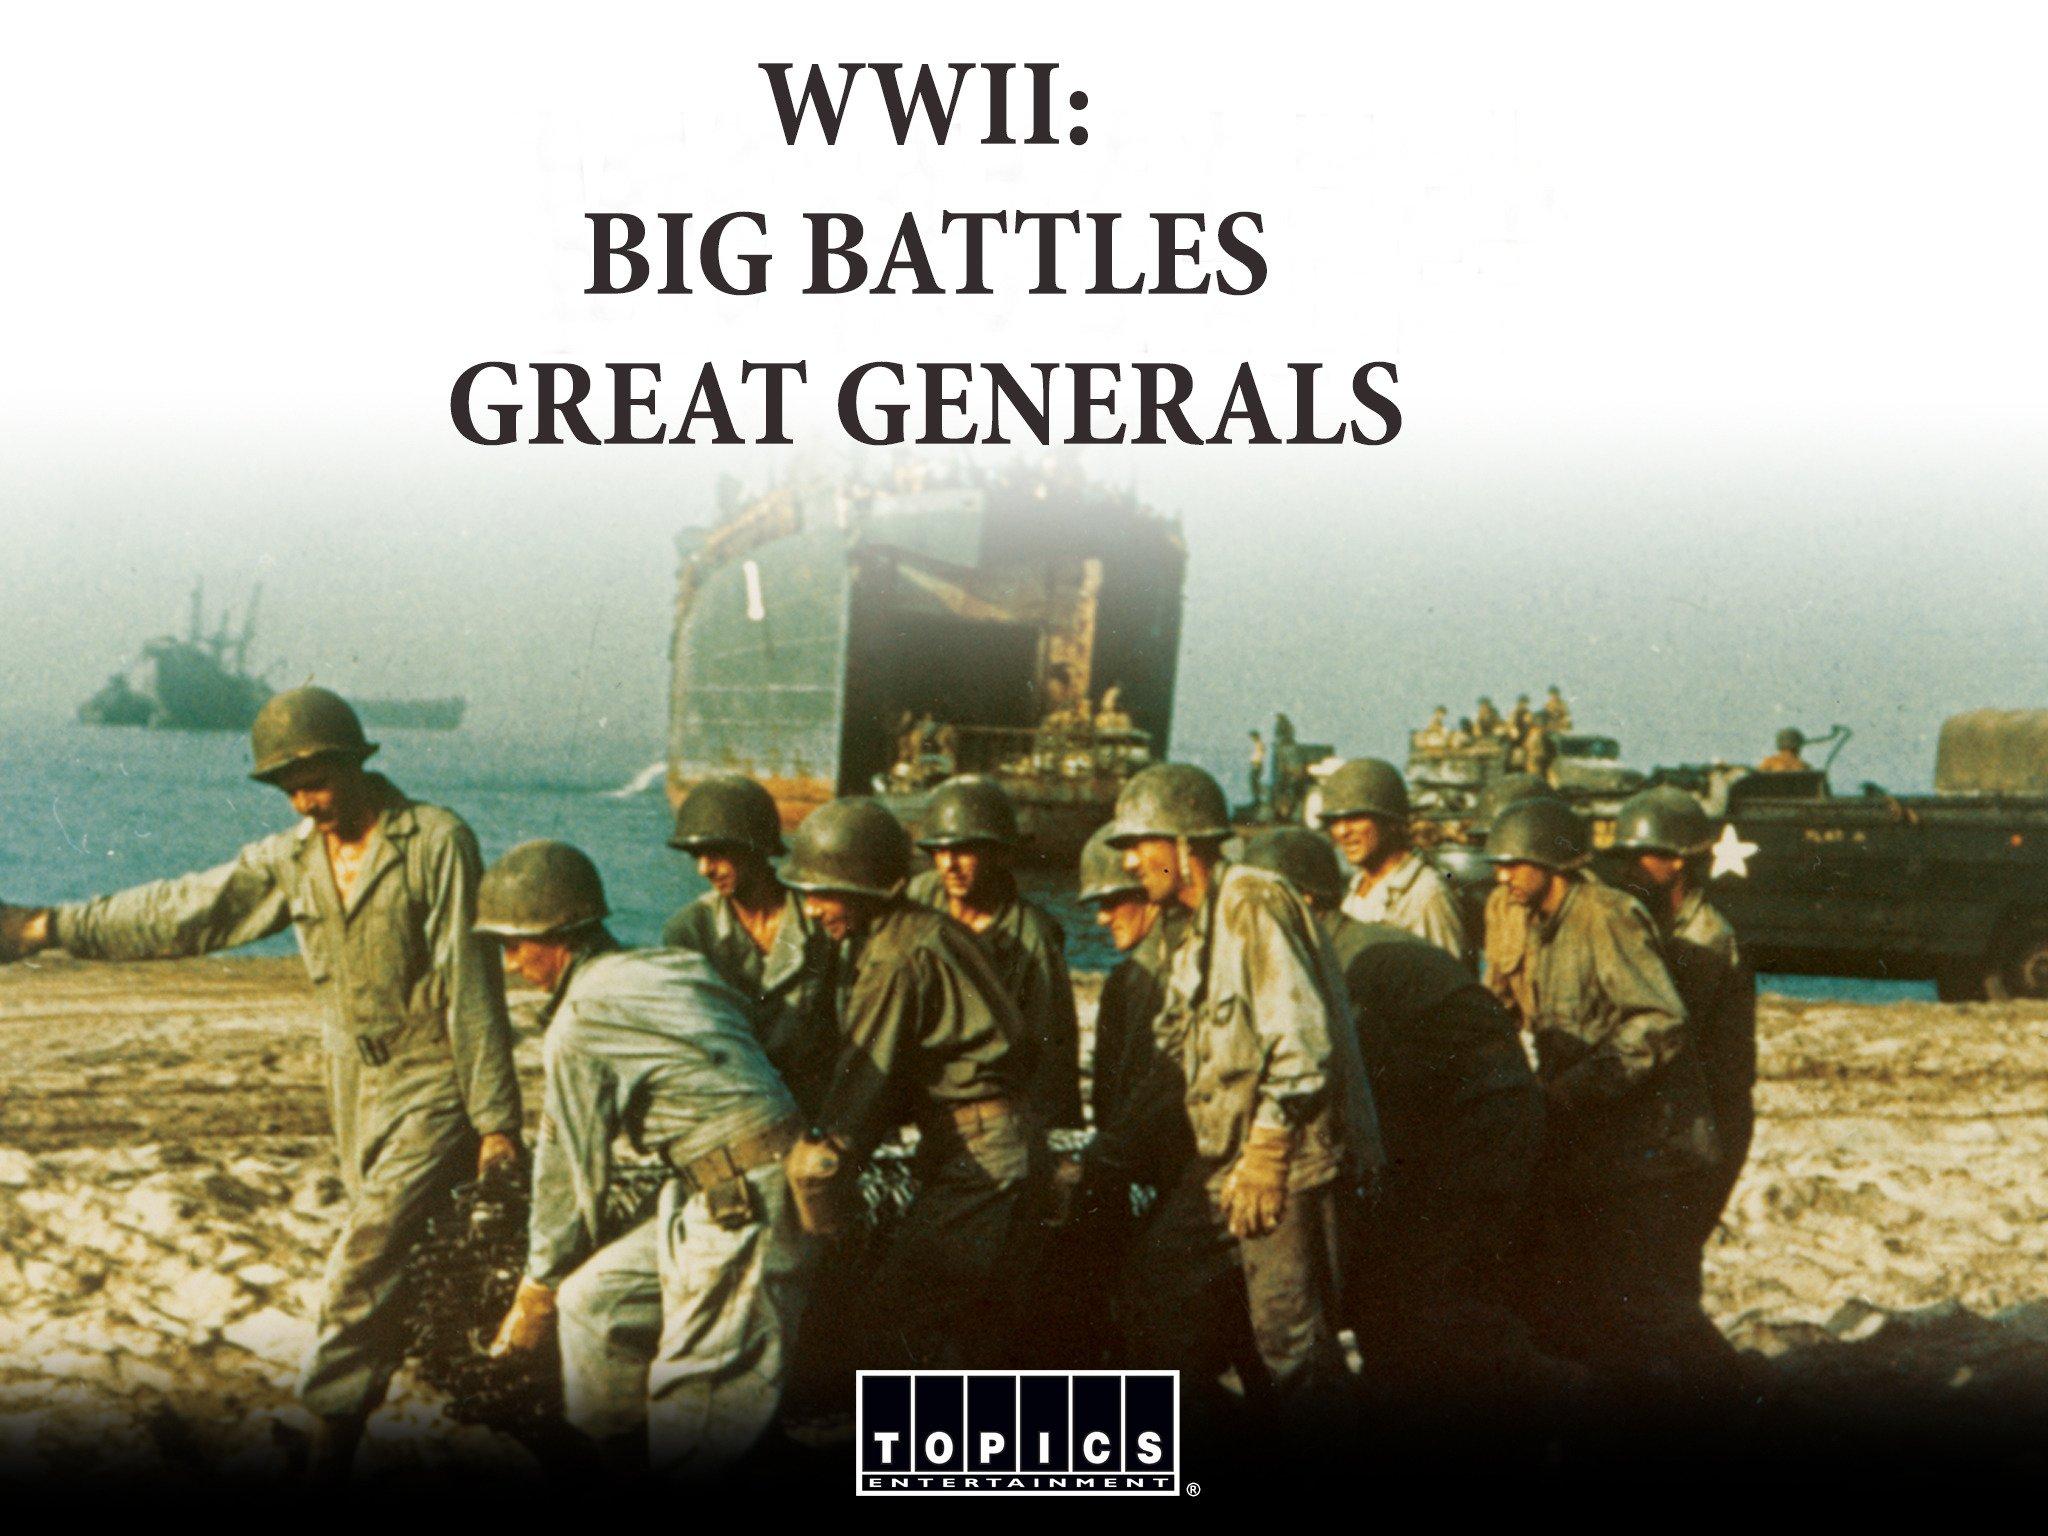 WWII: Big Battles, Great Generals